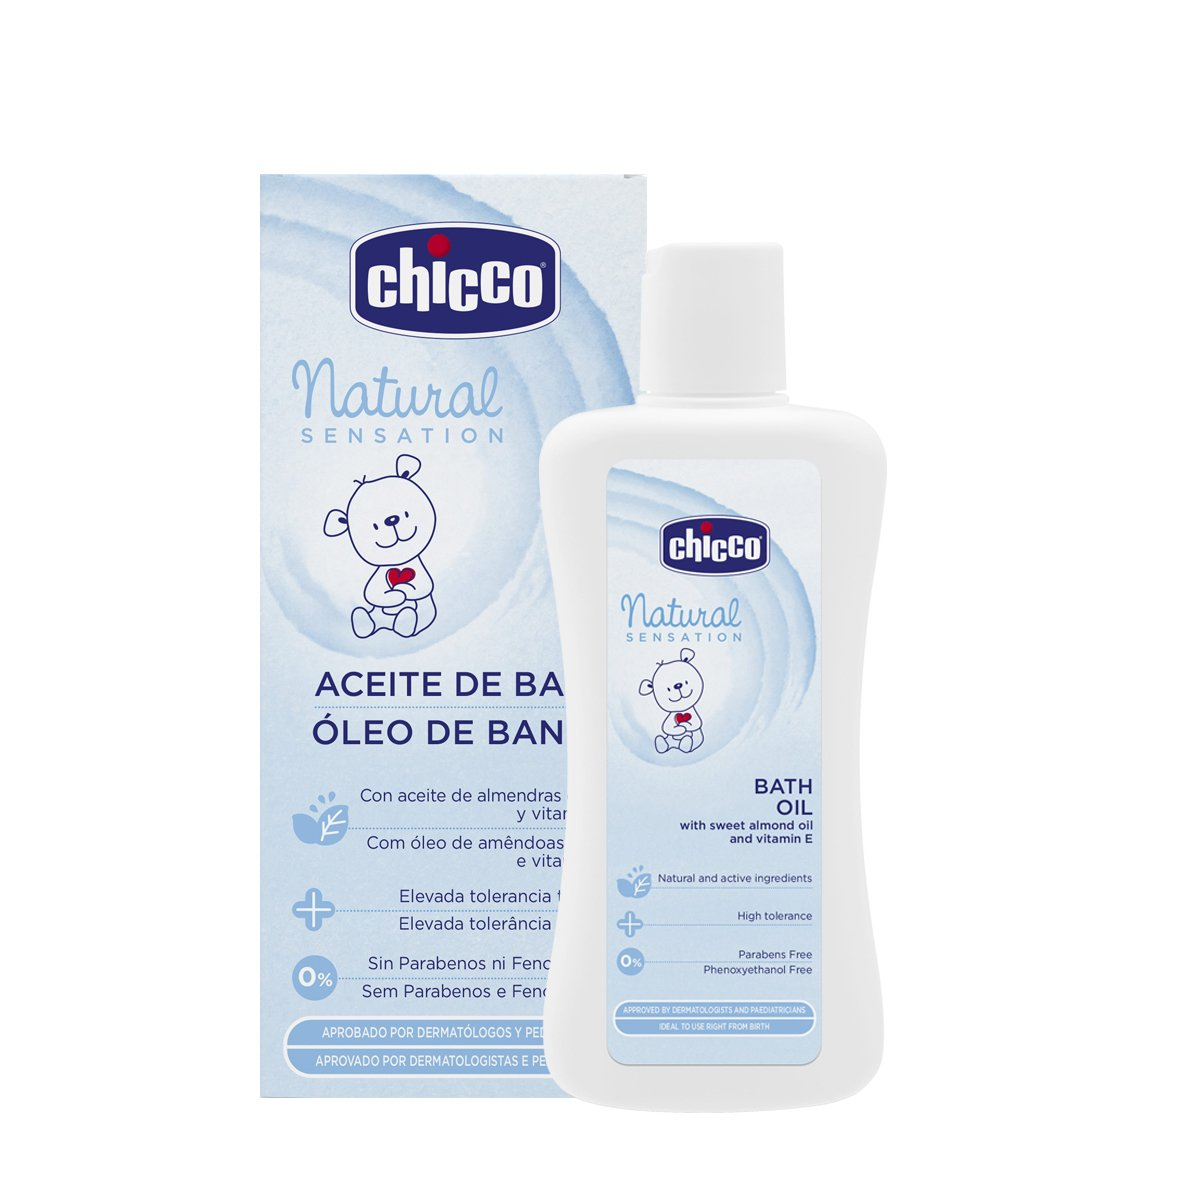 Chicco Natural Sensation - Aceite de baño, 200 ml